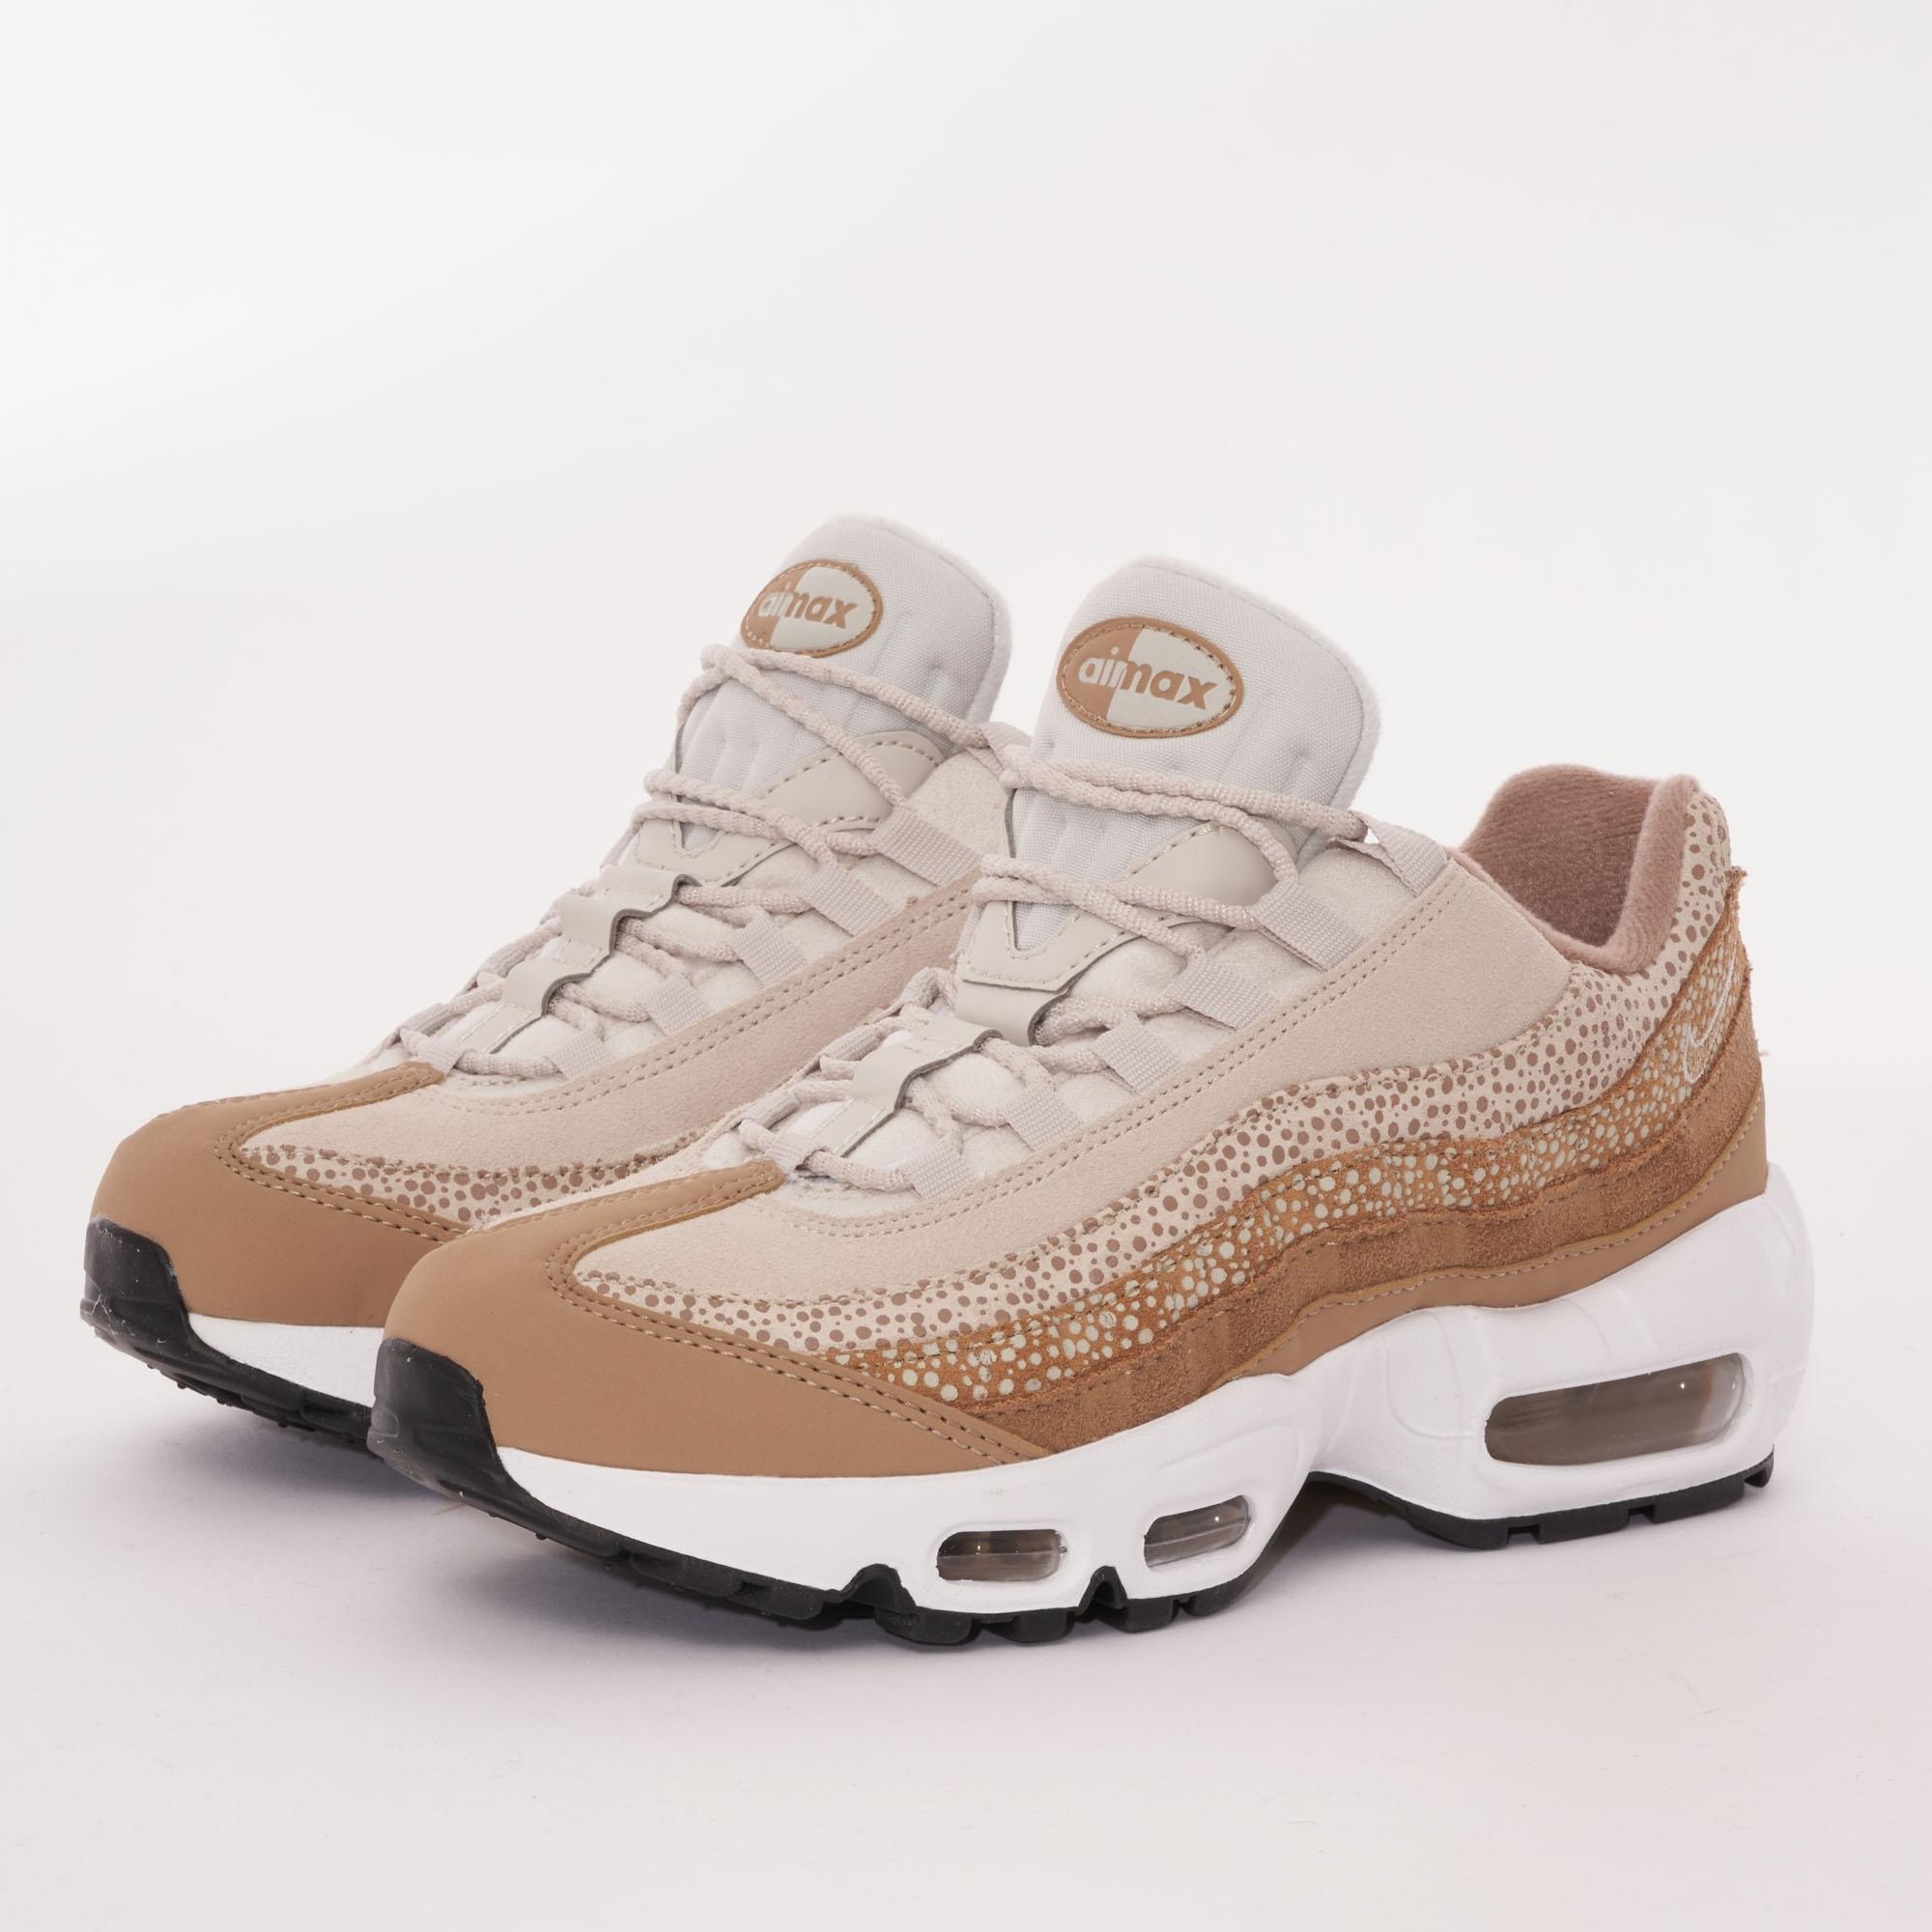 Nike Womens Air Max 95 Premium